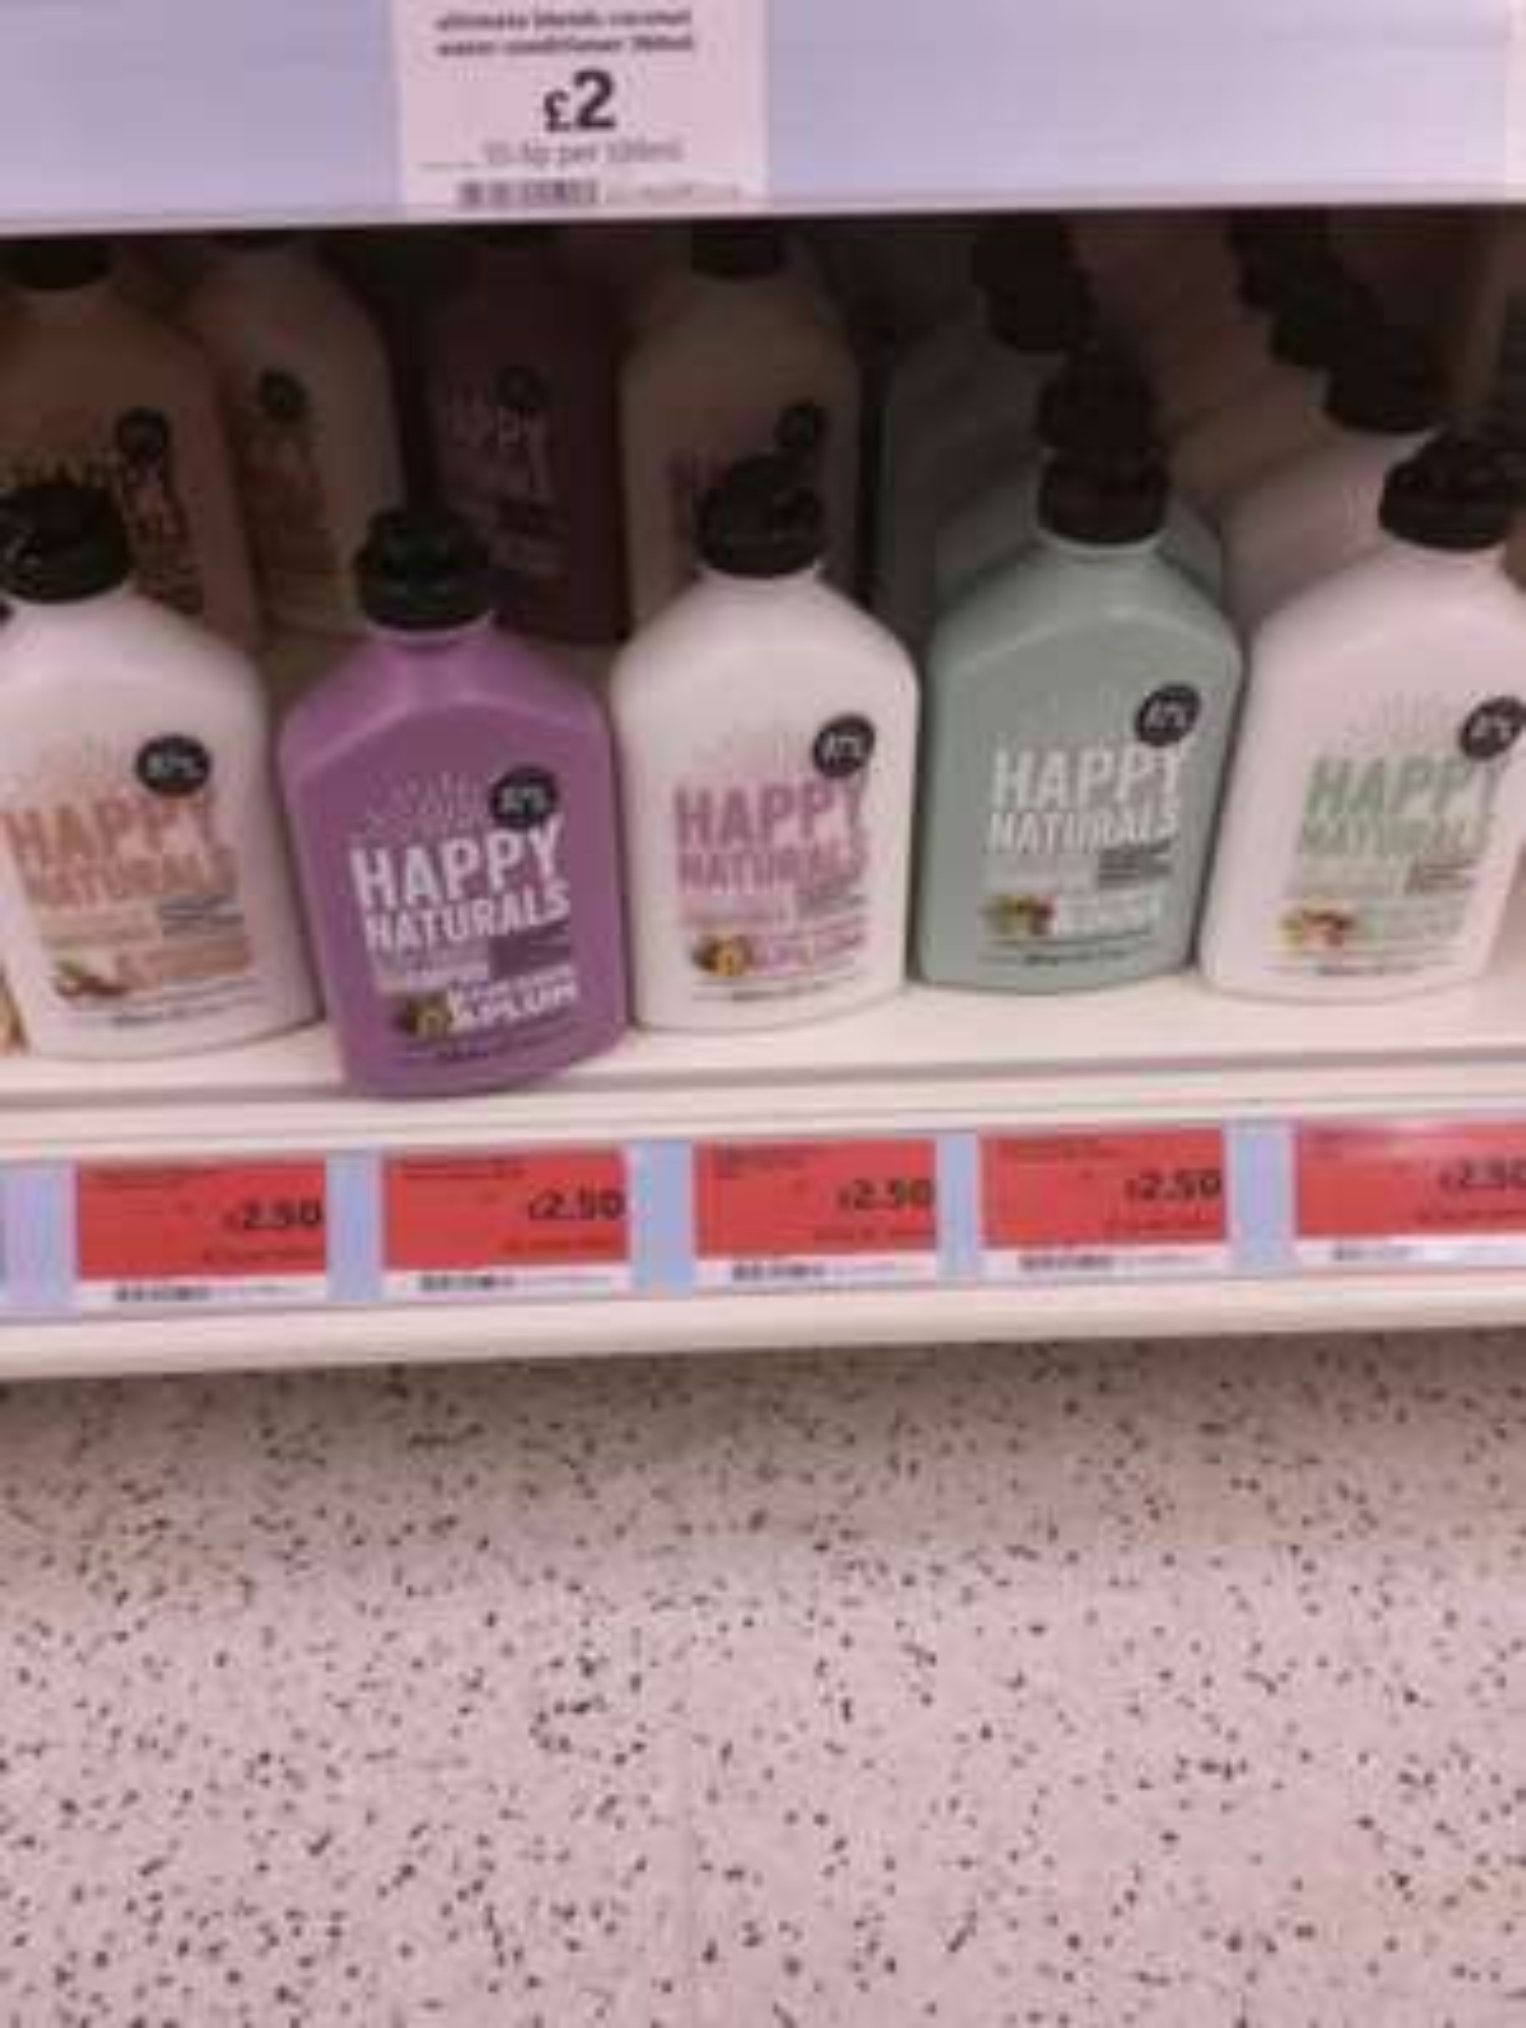 Happy Naturals shampoo and conditioner £2.50 @ Sainsbury's